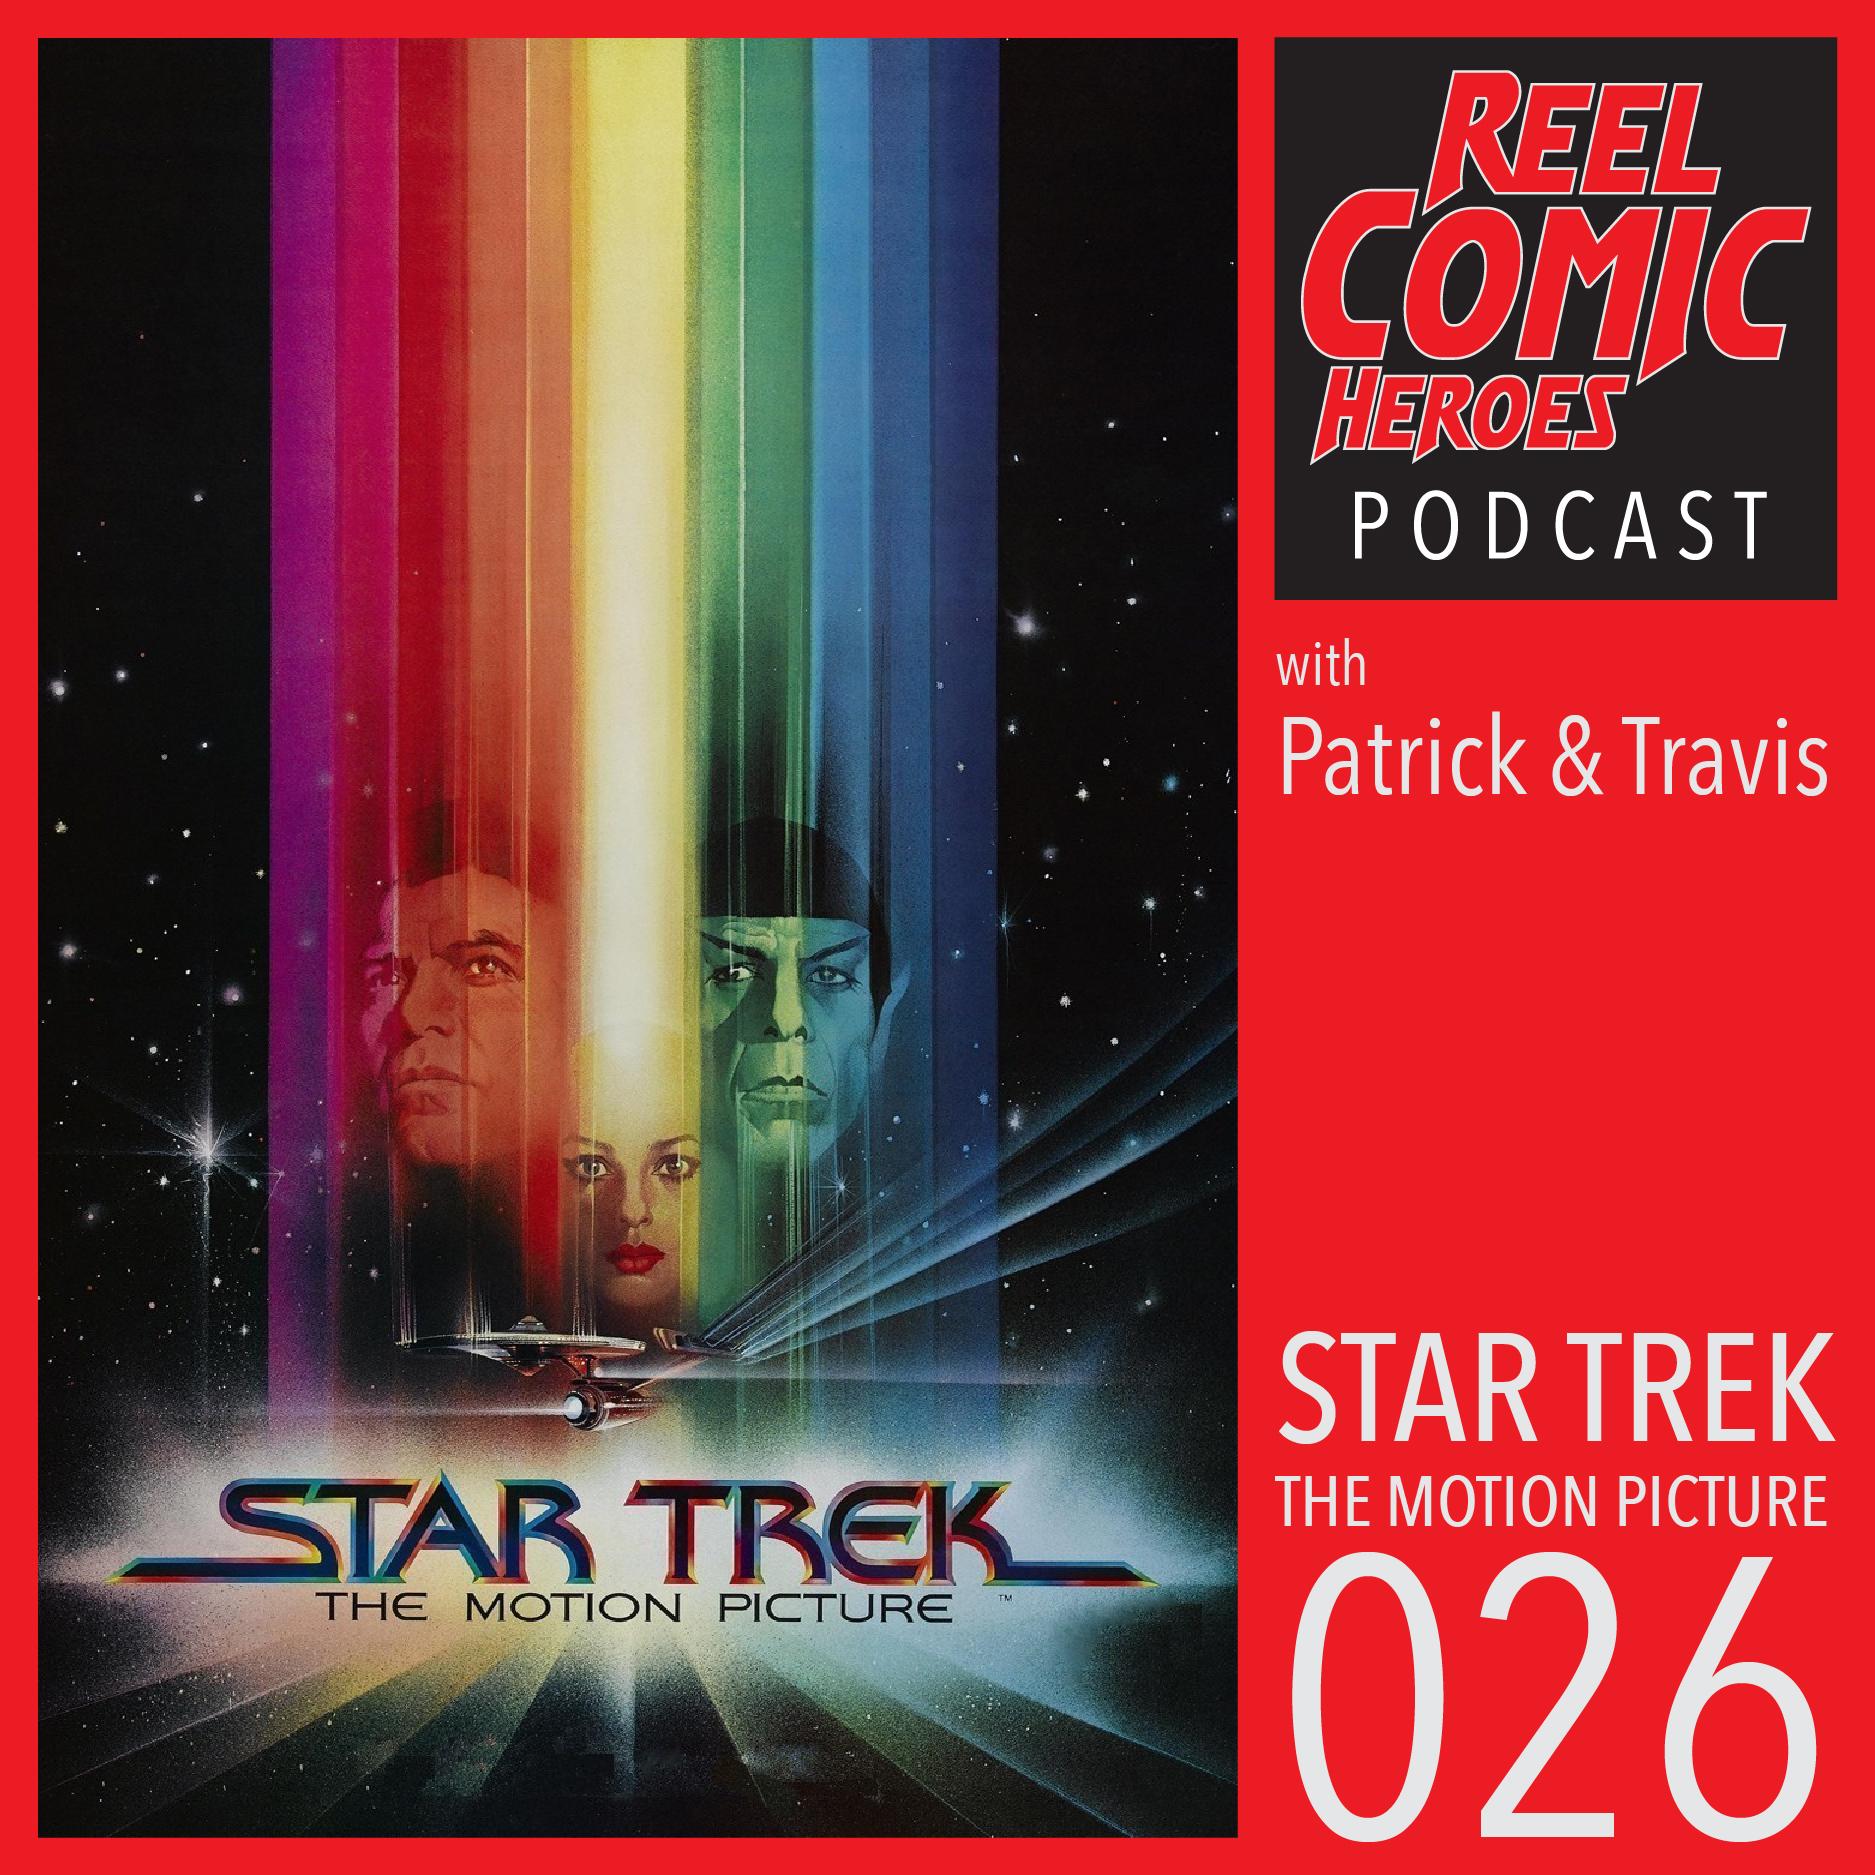 Artwork for Reel Comic Heroes 026 - Star Trek: The Motion Picture